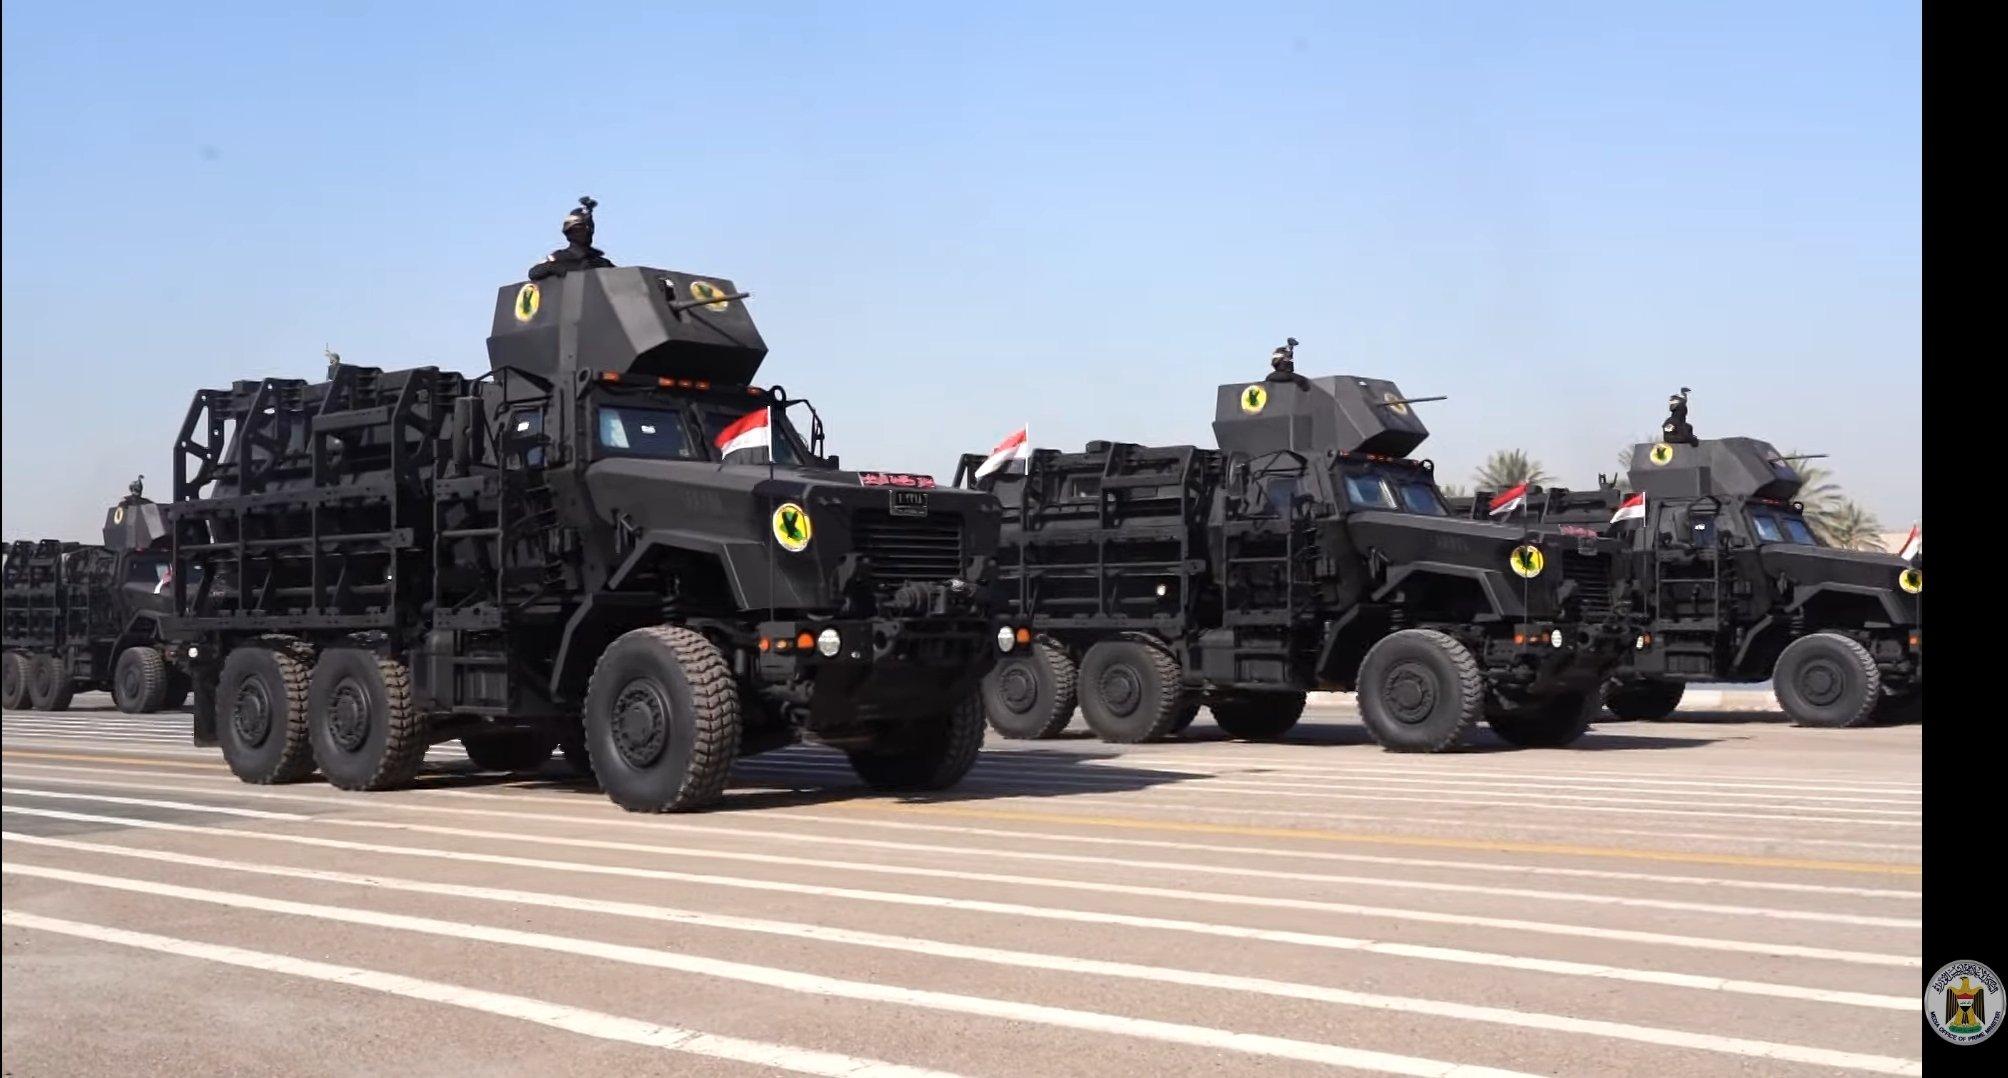 Armée Irakienne / Iraqi Armed Forces - Page 38 ErHyLBLXIAAS5jb?format=jpg&name=large